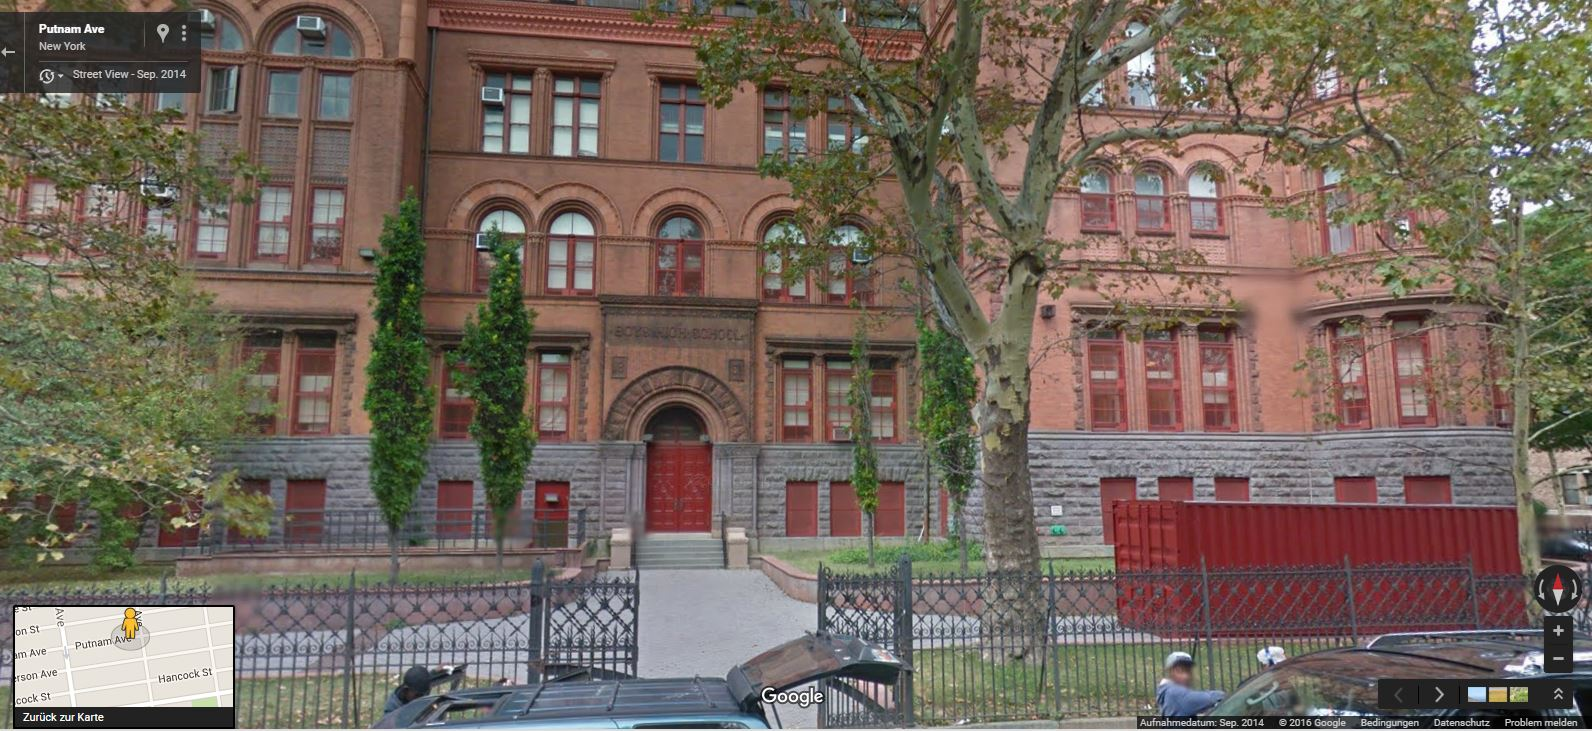 new york history geschichte the knick erbocker hospital. Black Bedroom Furniture Sets. Home Design Ideas